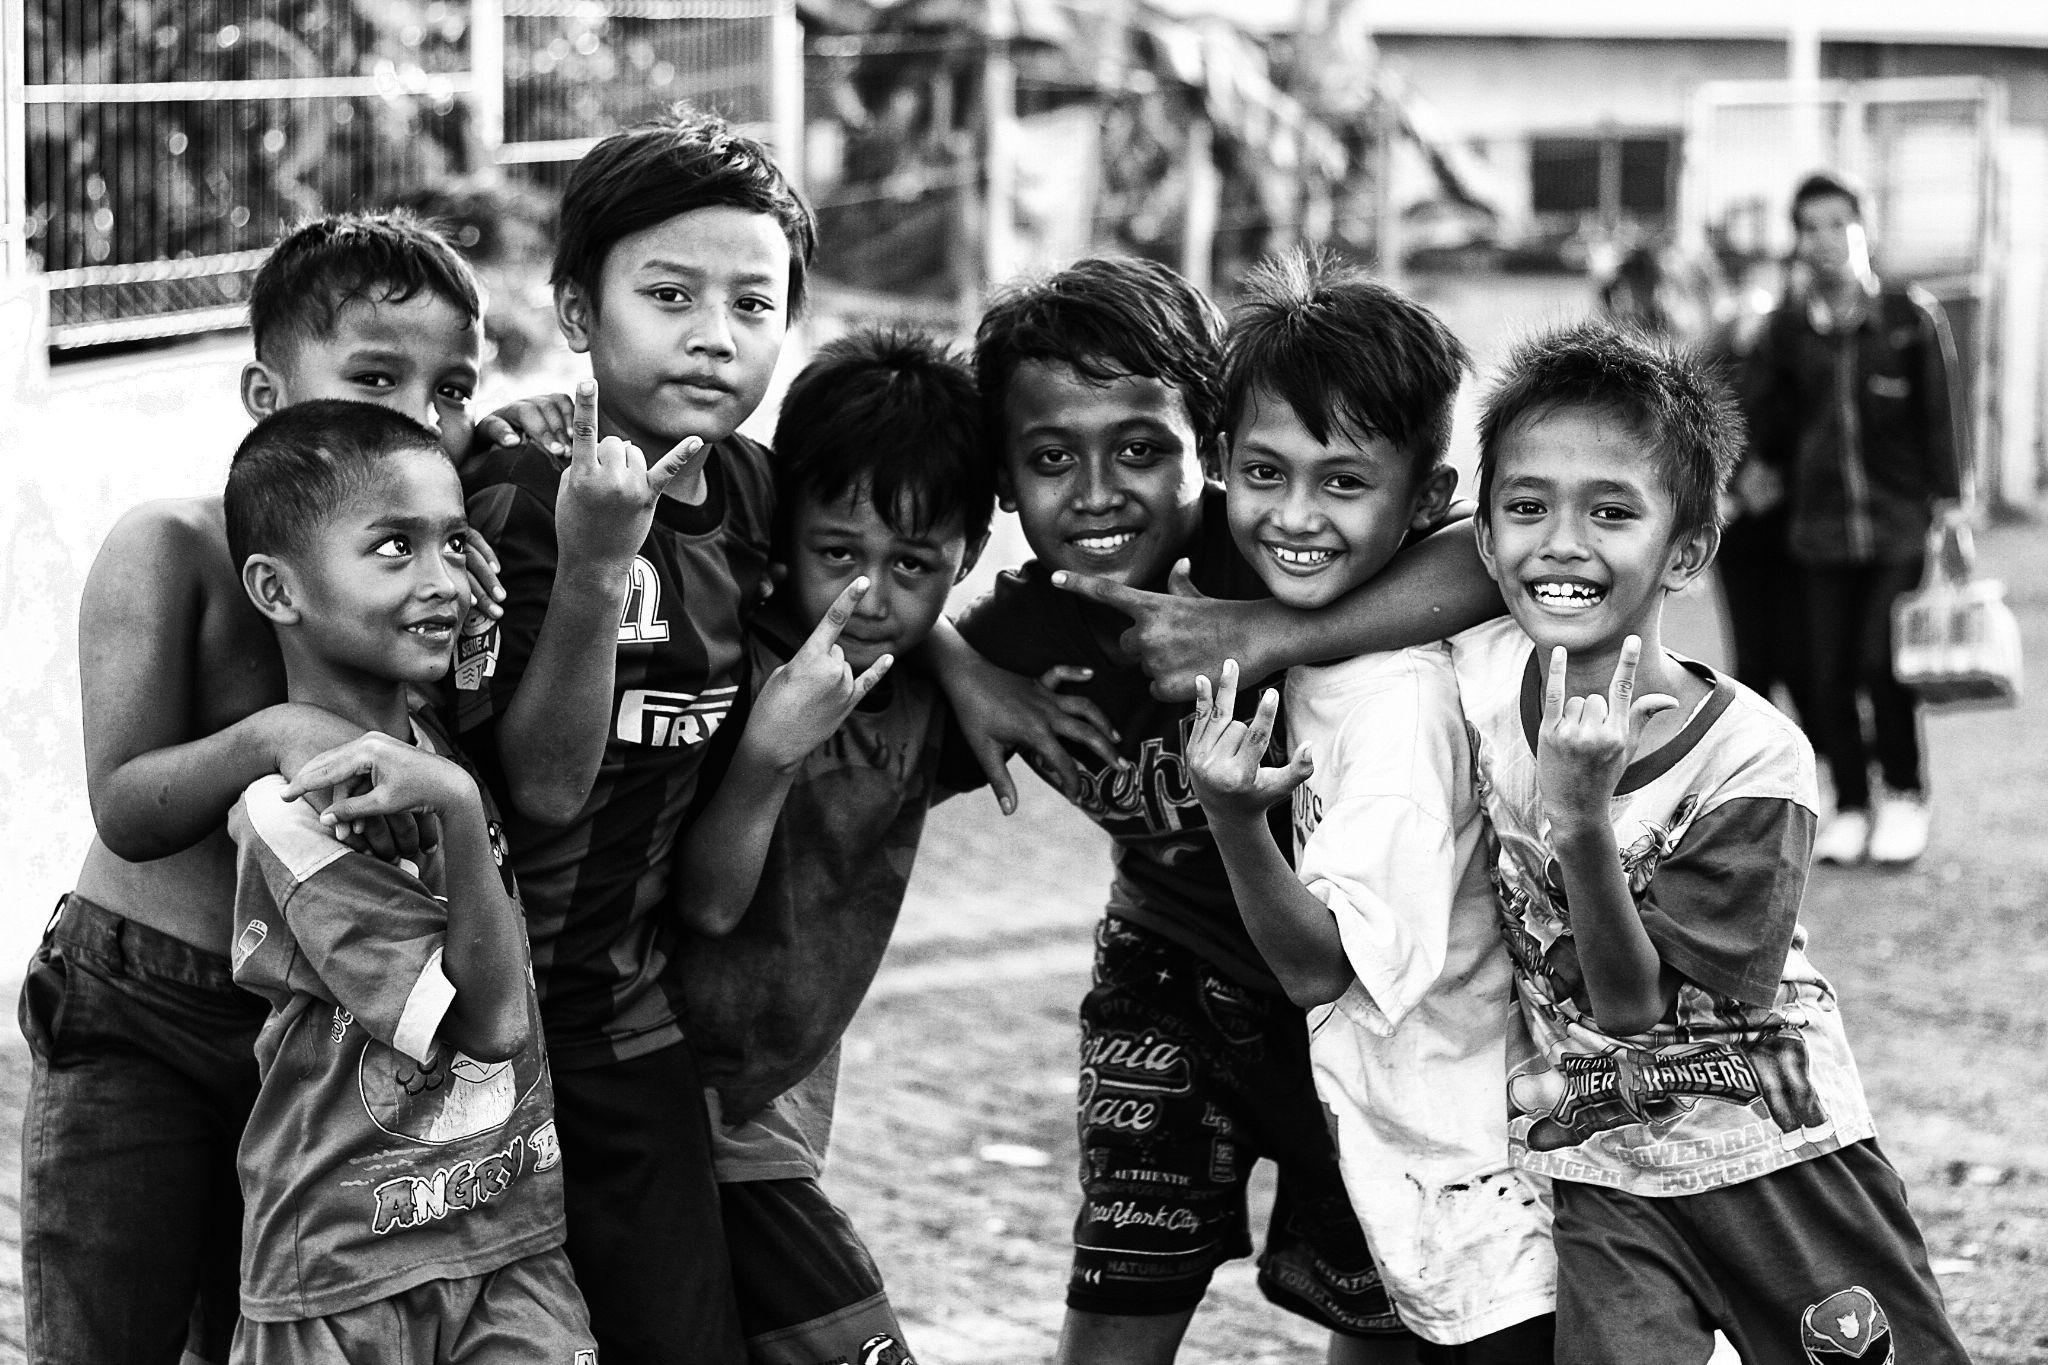 SURABAYA_IndonesiaOnTheStreet #60 by Jo Simson